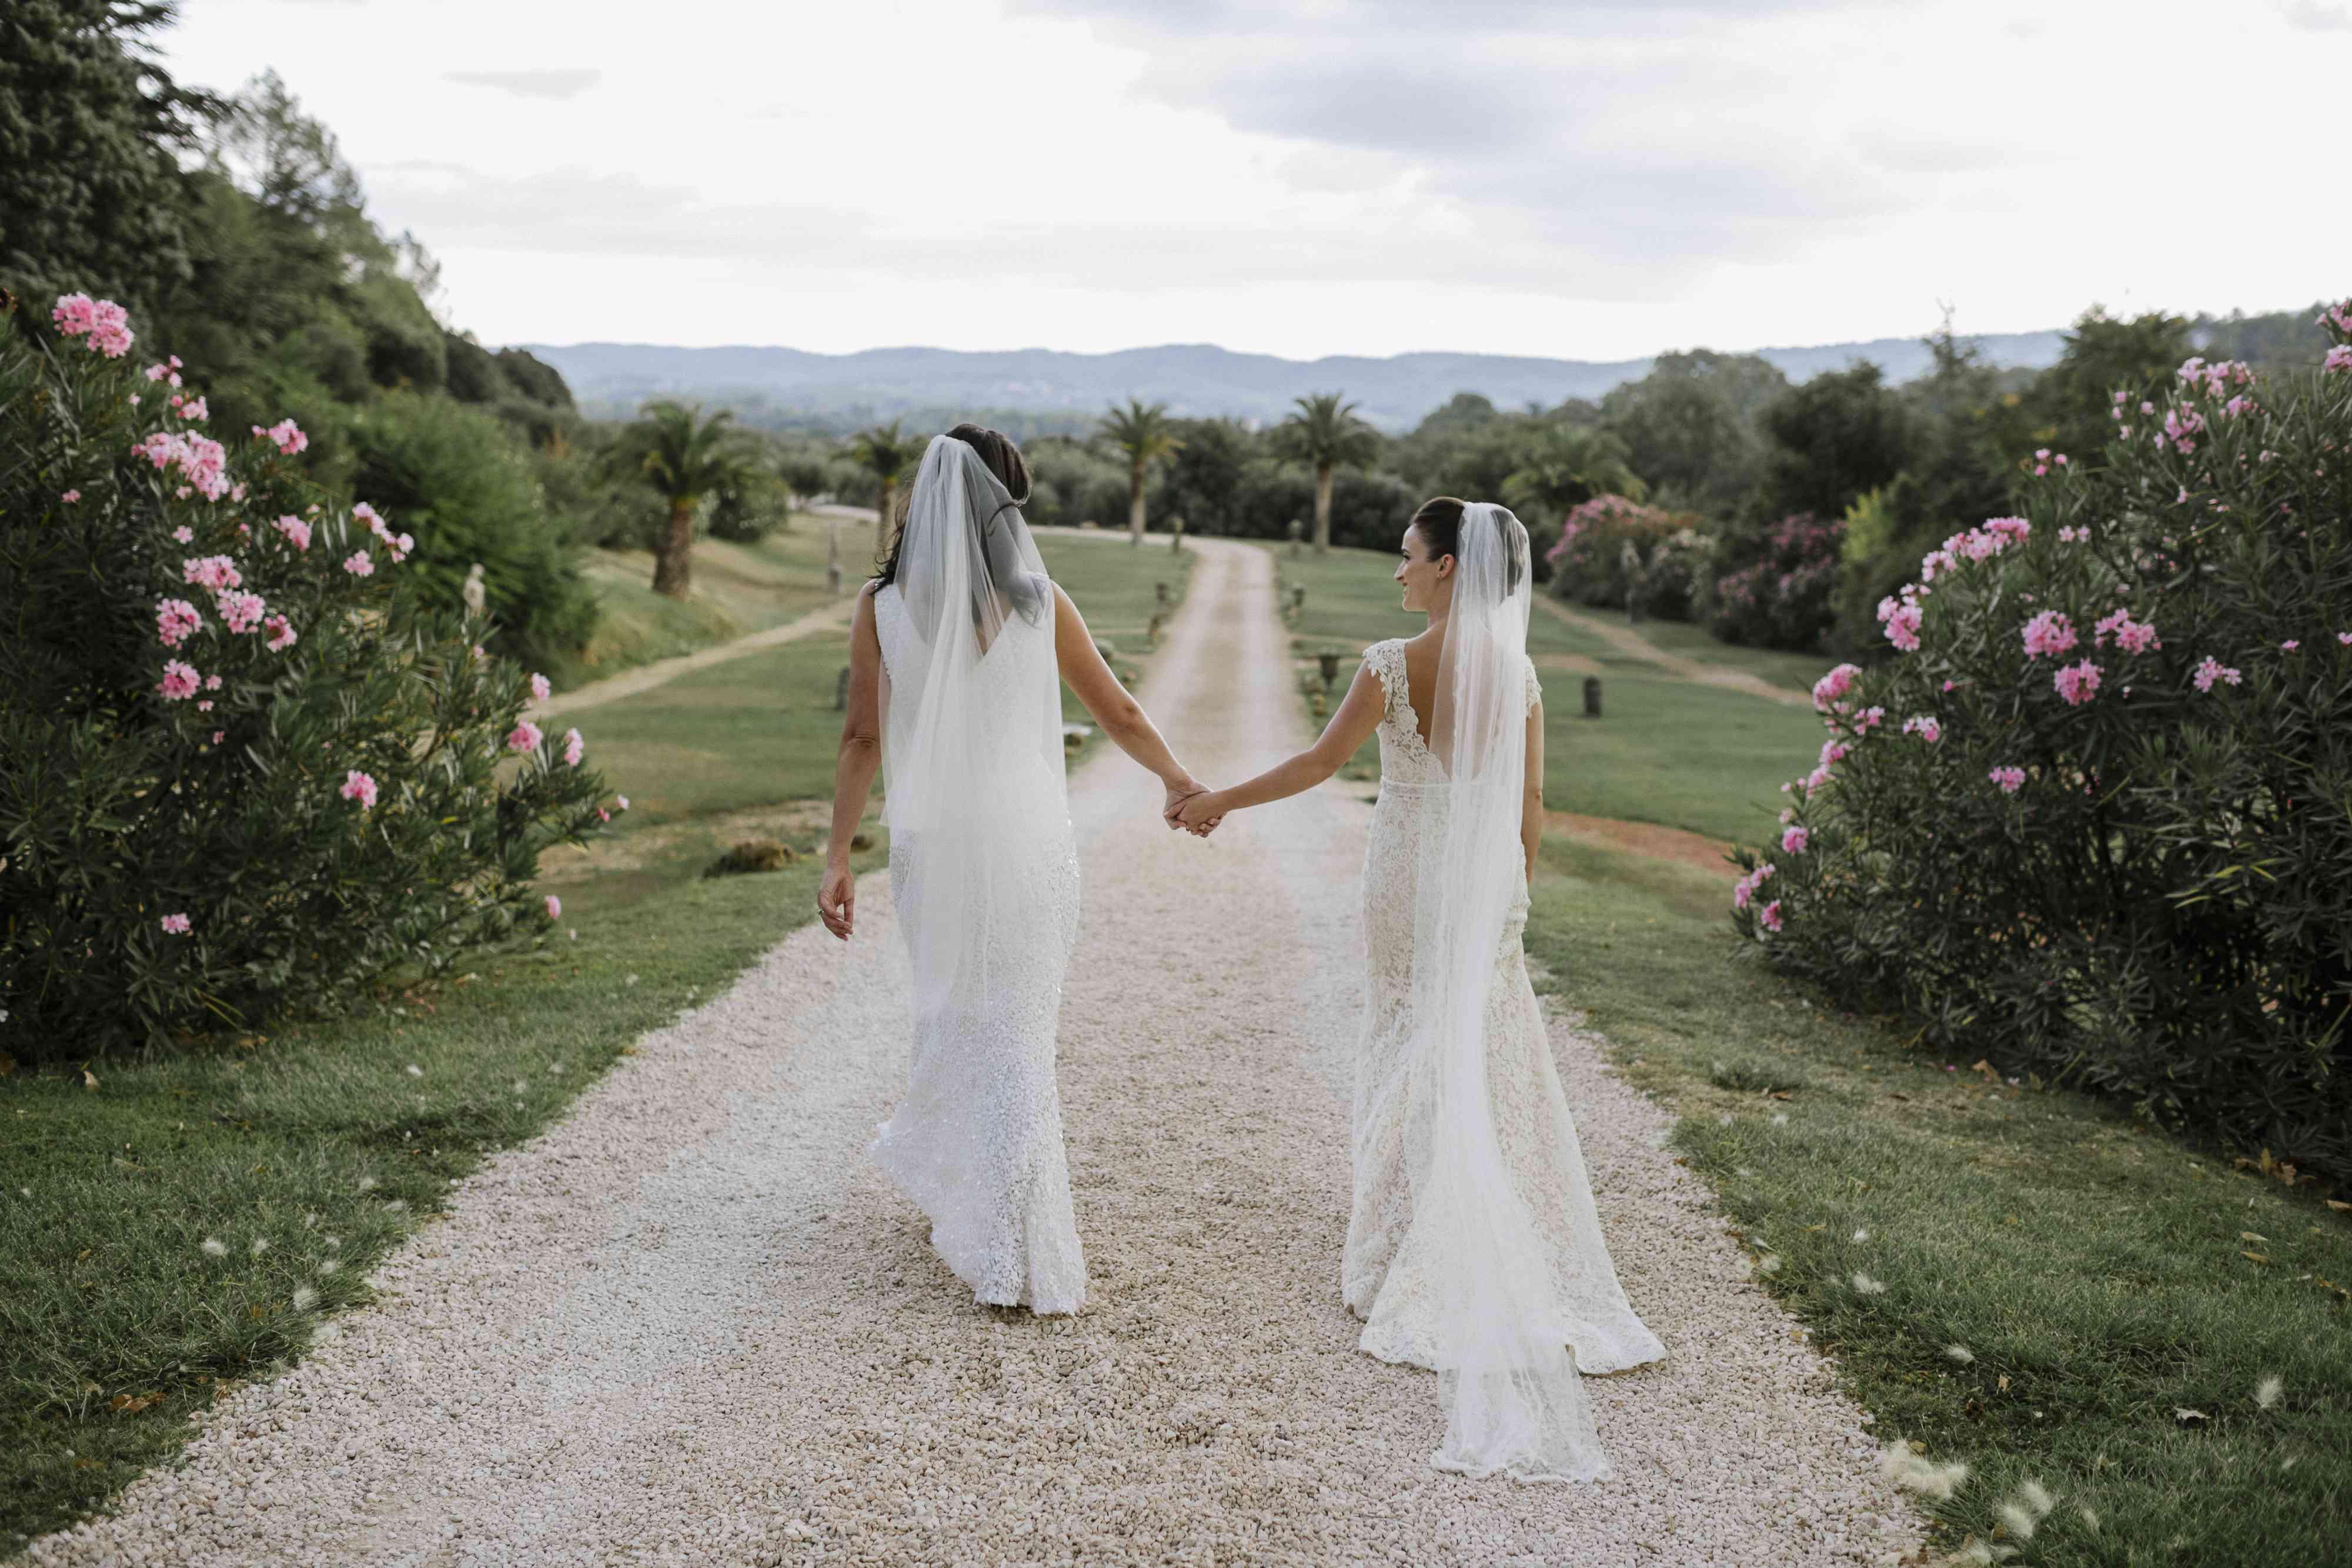 <p>brides holding hands</p><br><br>